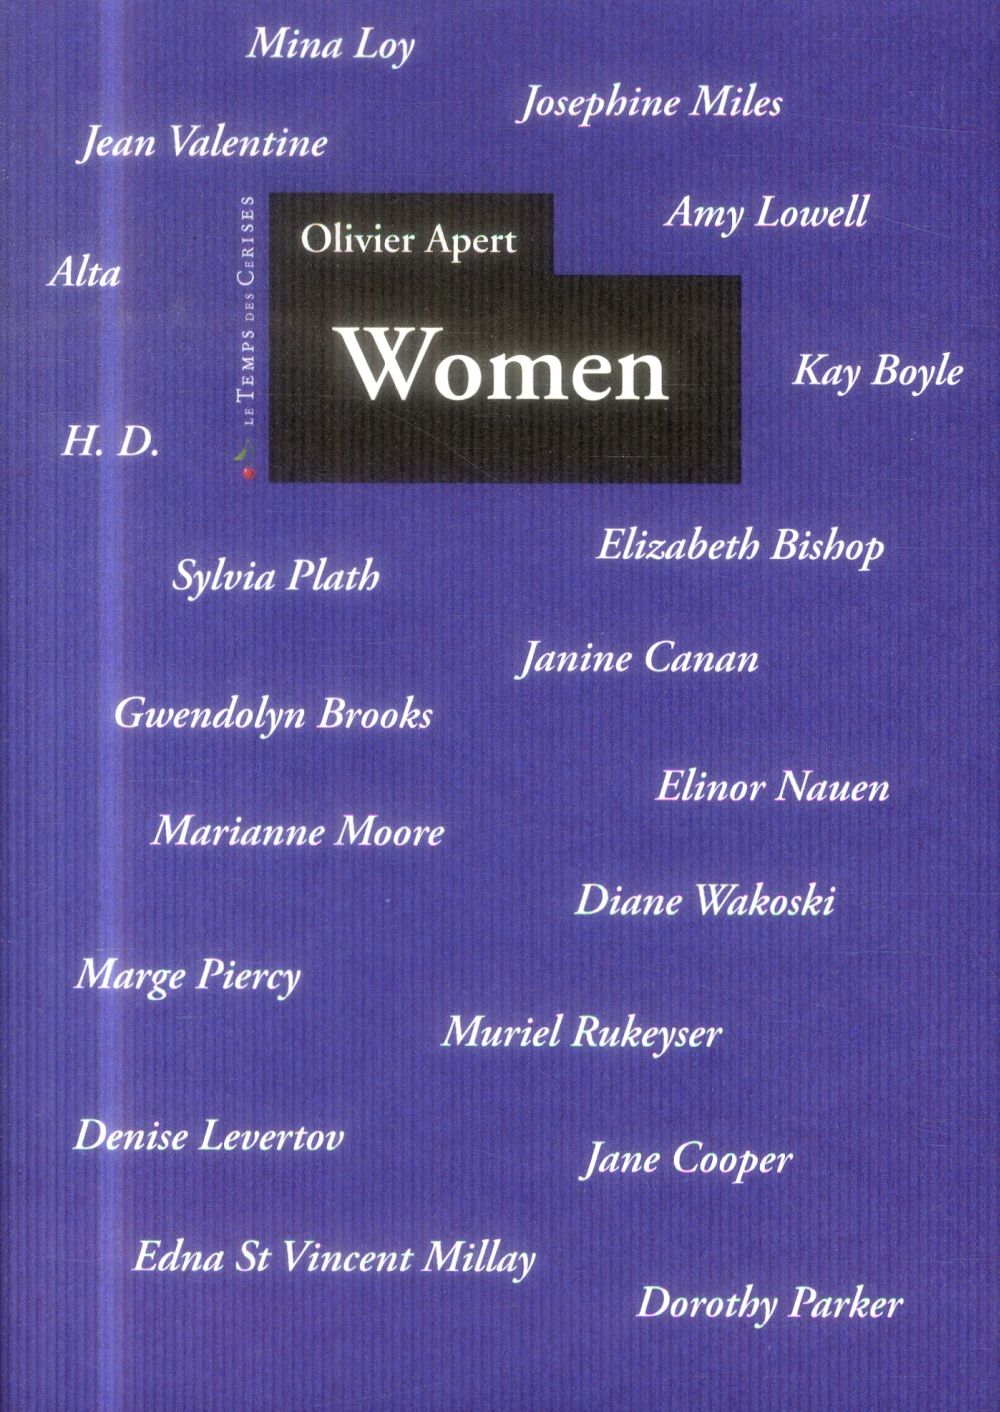 WOMEN, UNE ANTHOLOGIE DE LA POESIE FEMININE AMERICAINE